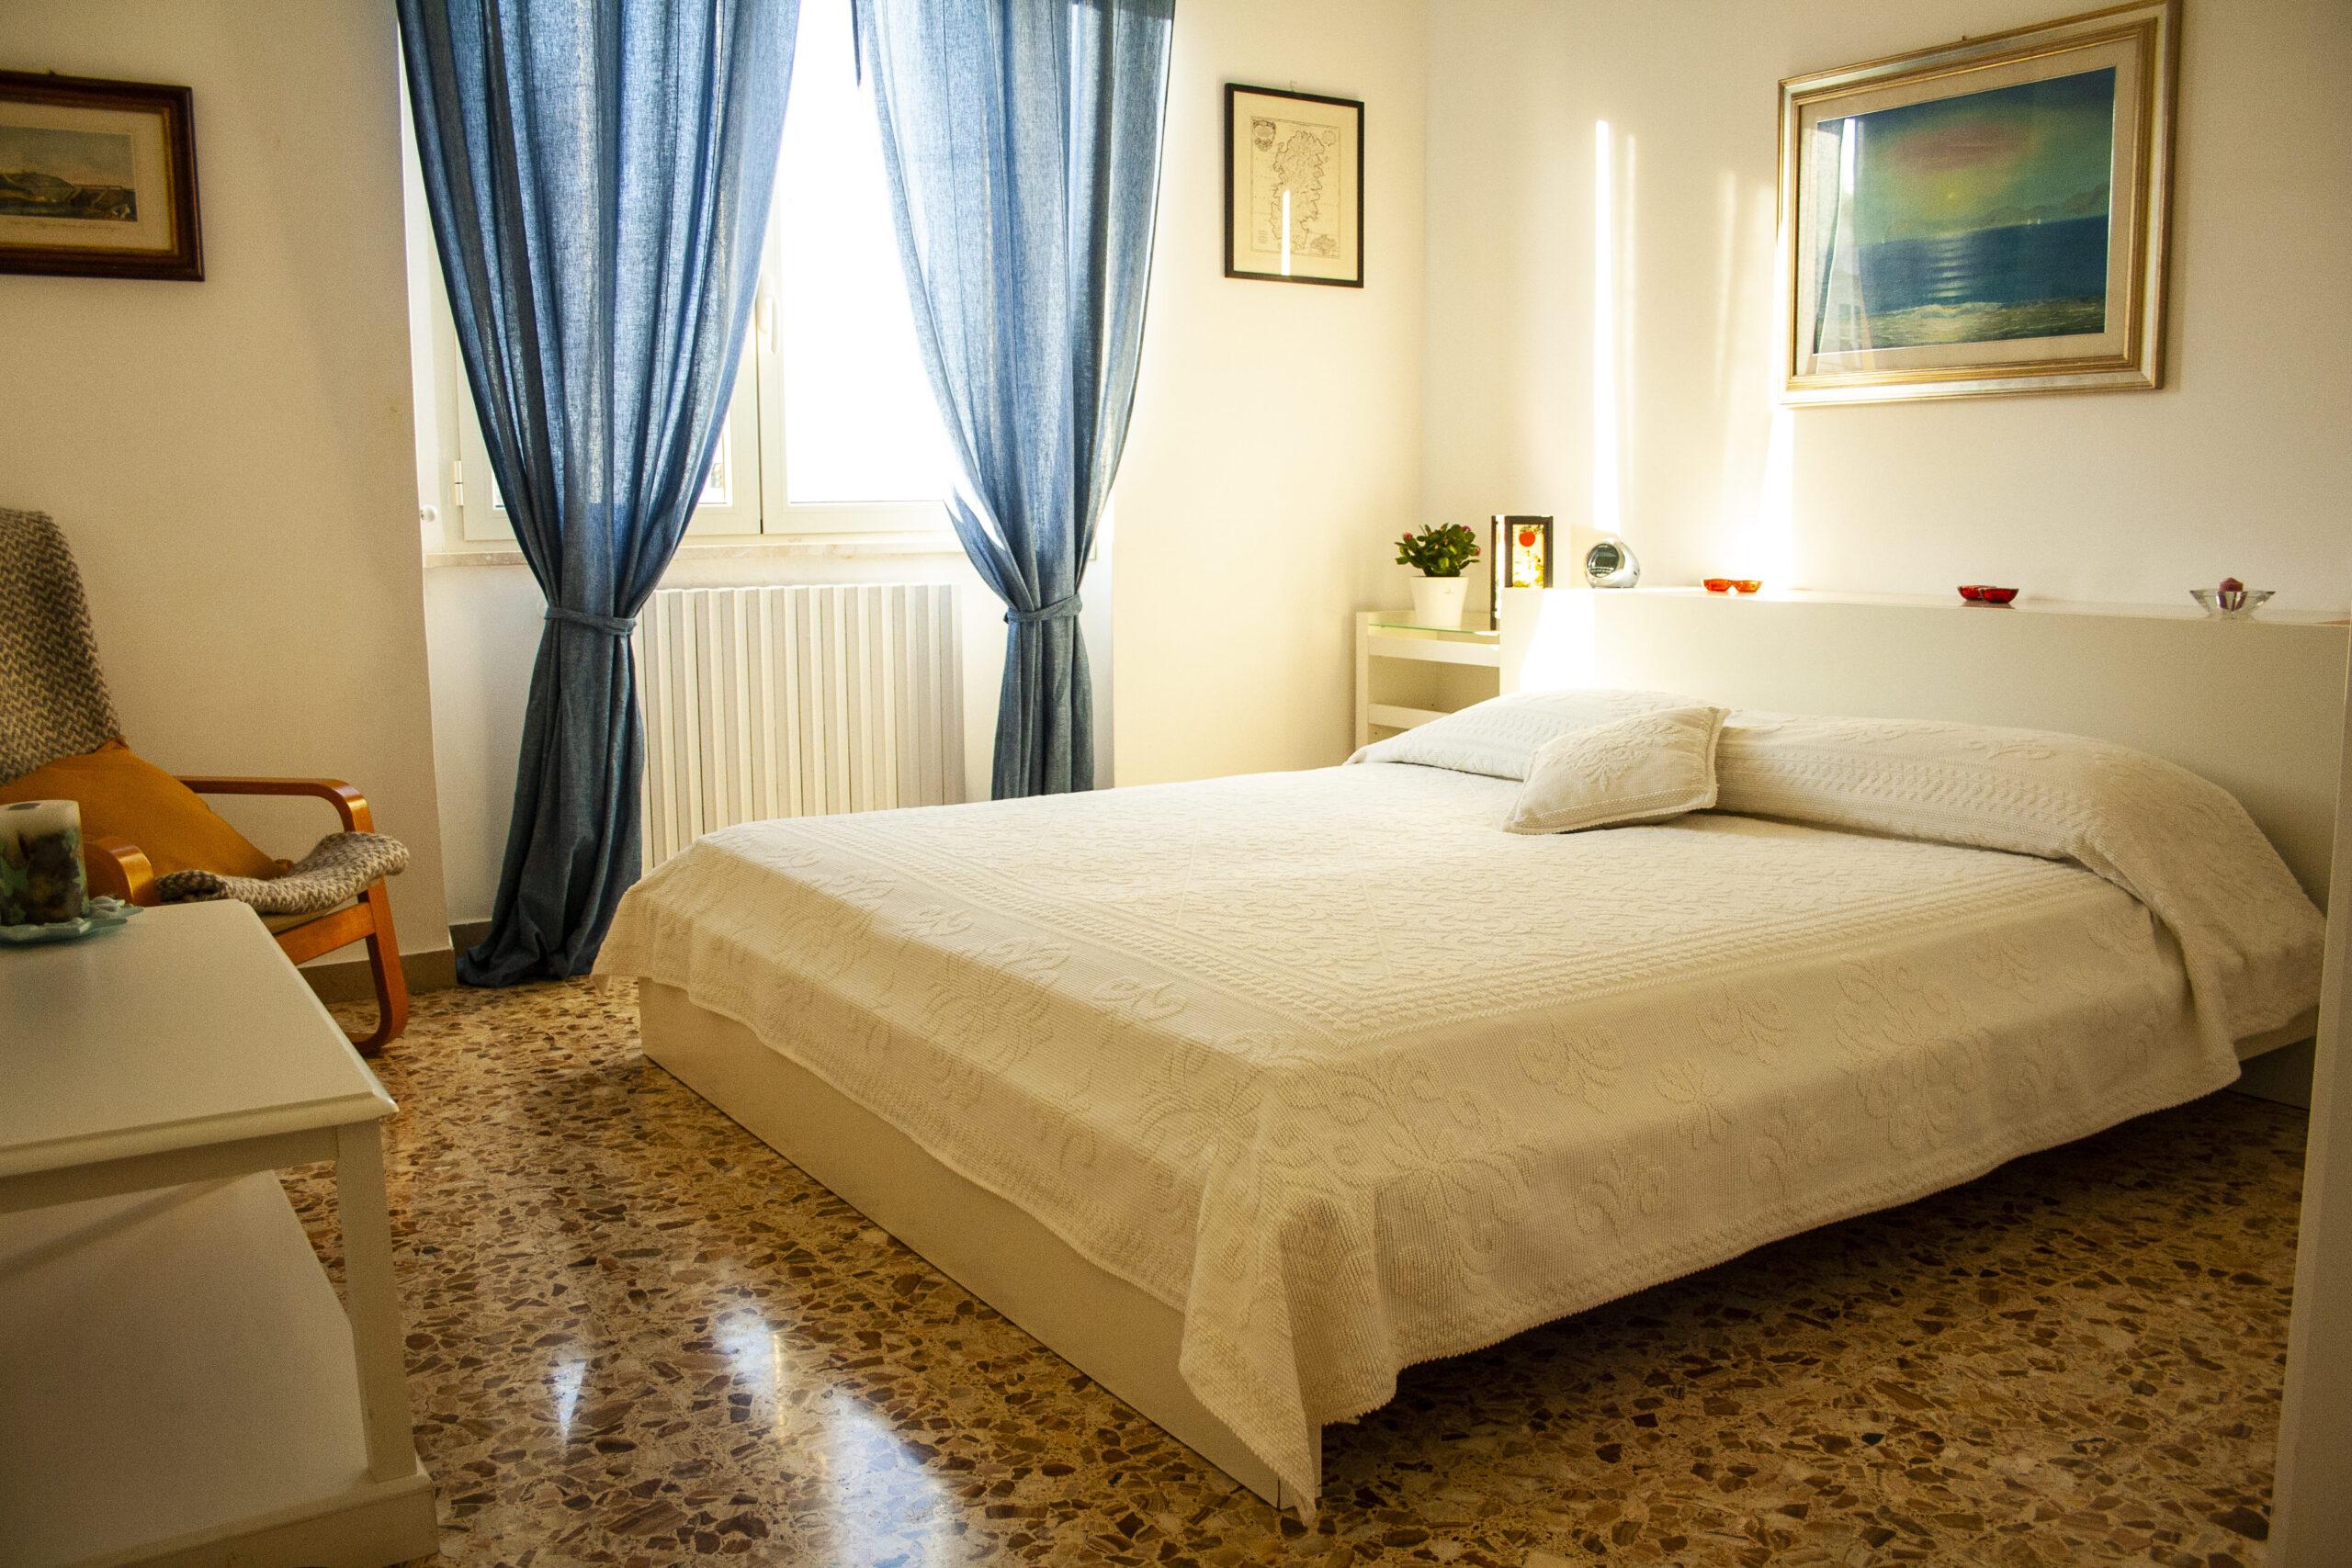 Maistali Room Bonu Bentu Apartmen Cagliari Sardinia